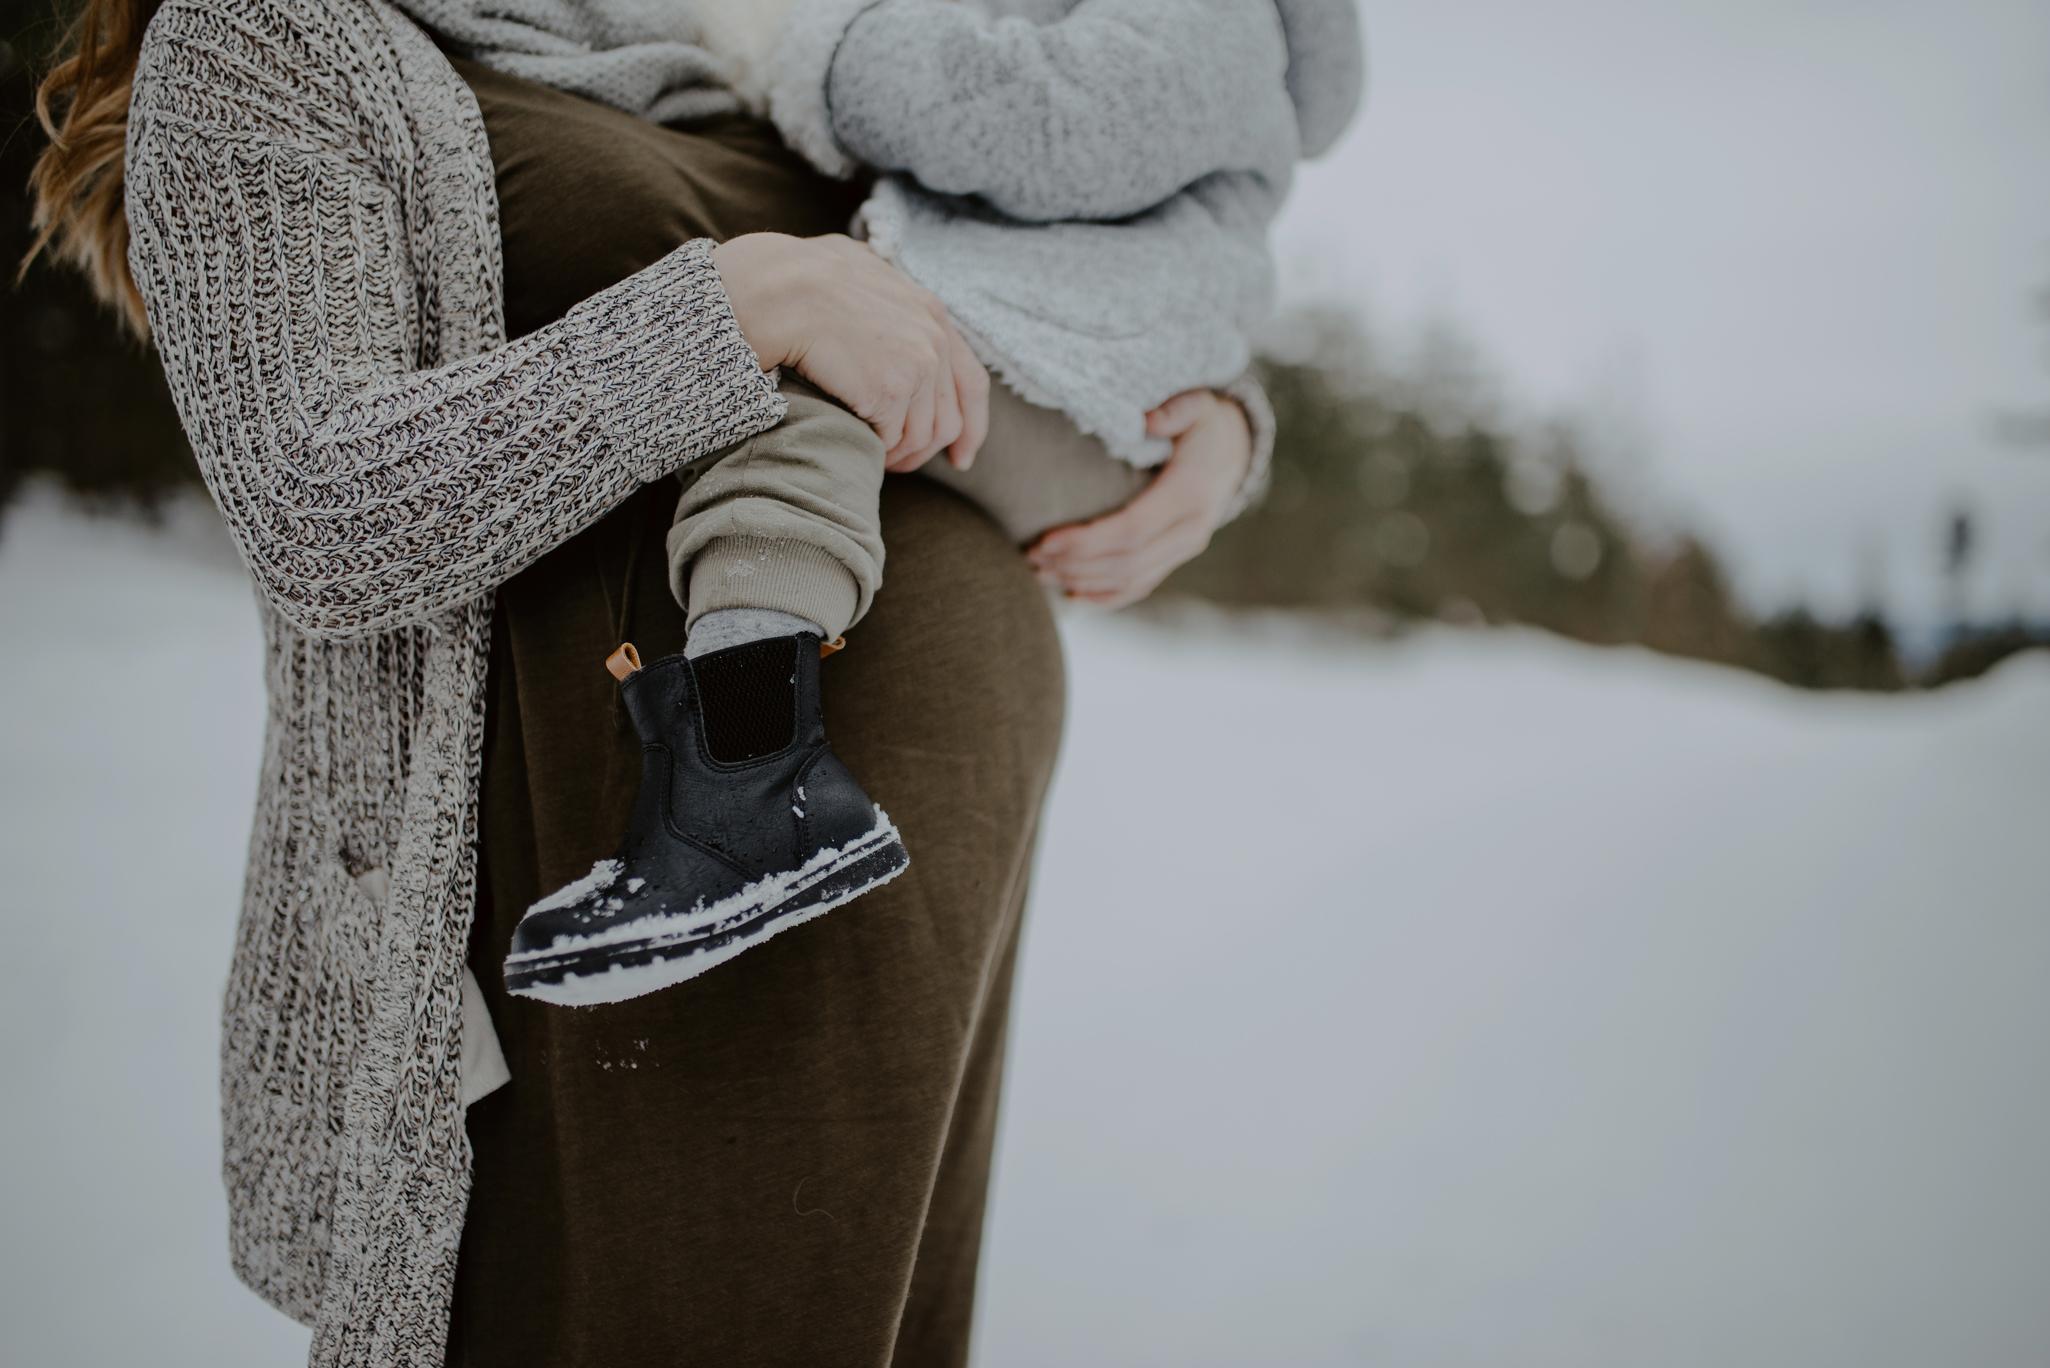 Familjefotografering i ett vitt Dalarna